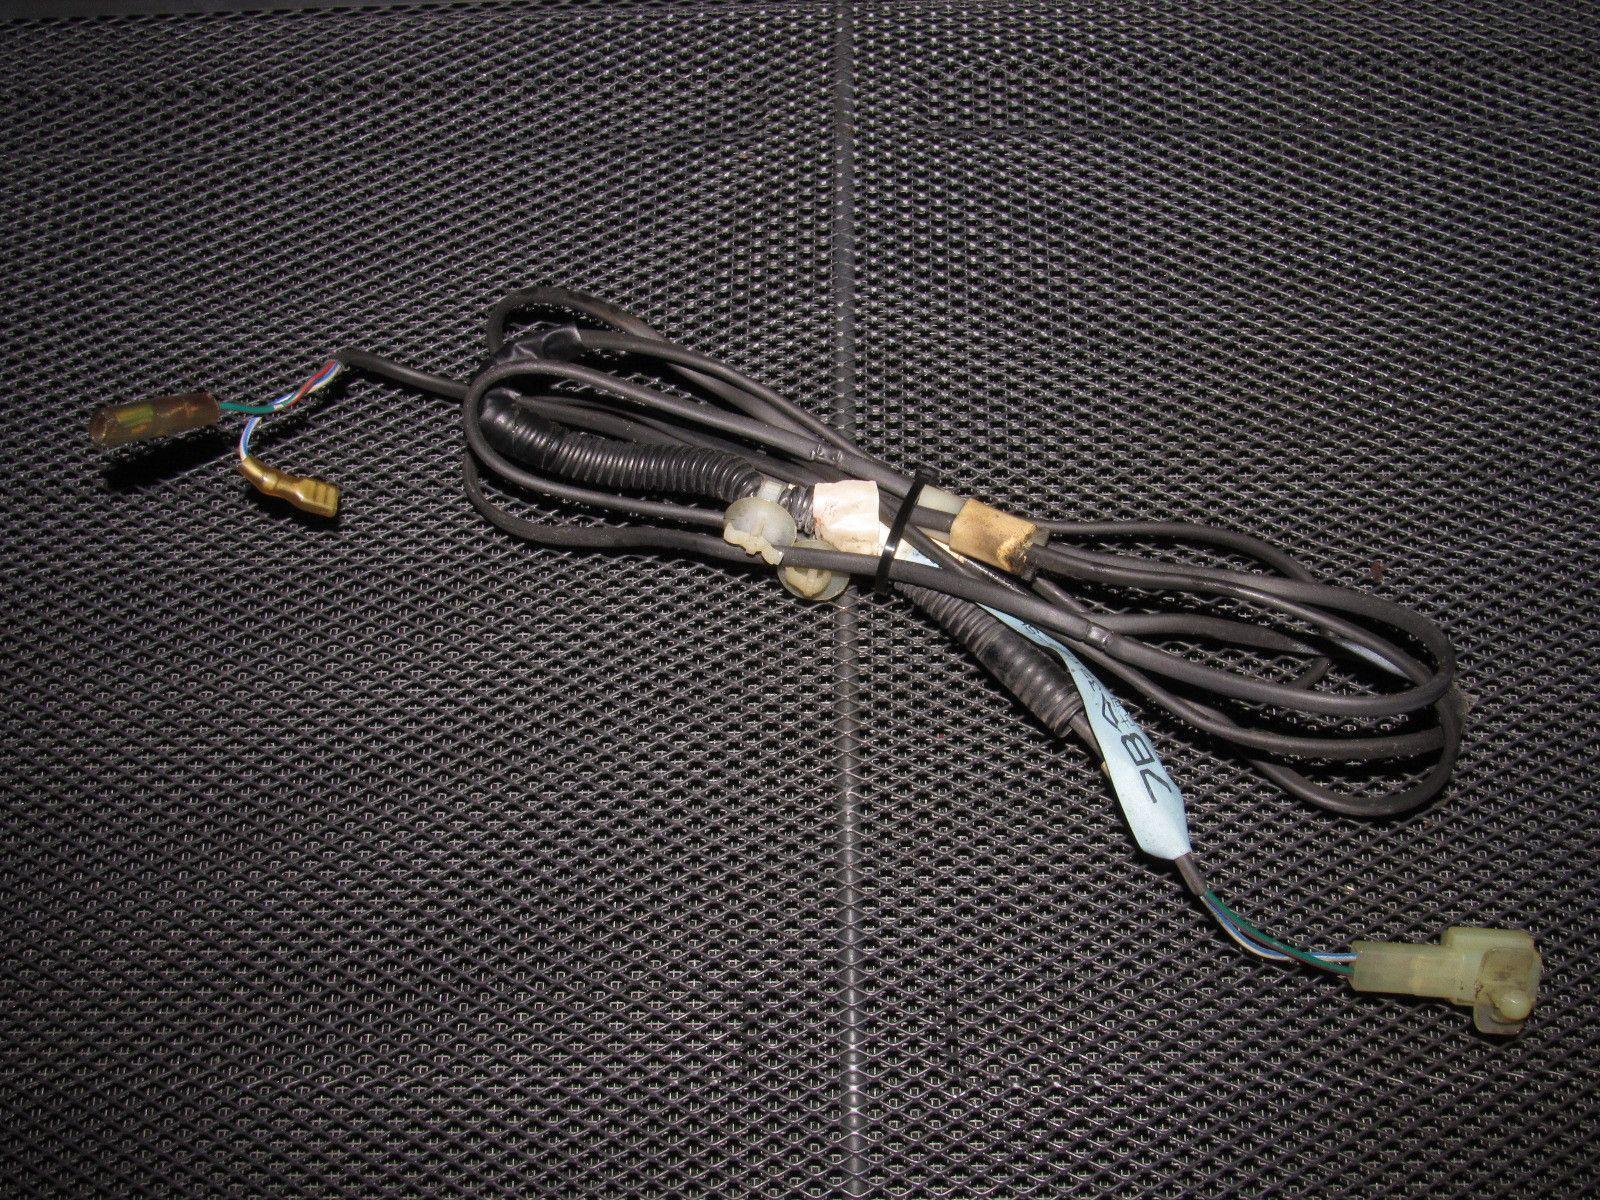 88 89 honda crx oem headliner rear map light wiring harness [ 1600 x 1200 Pixel ]